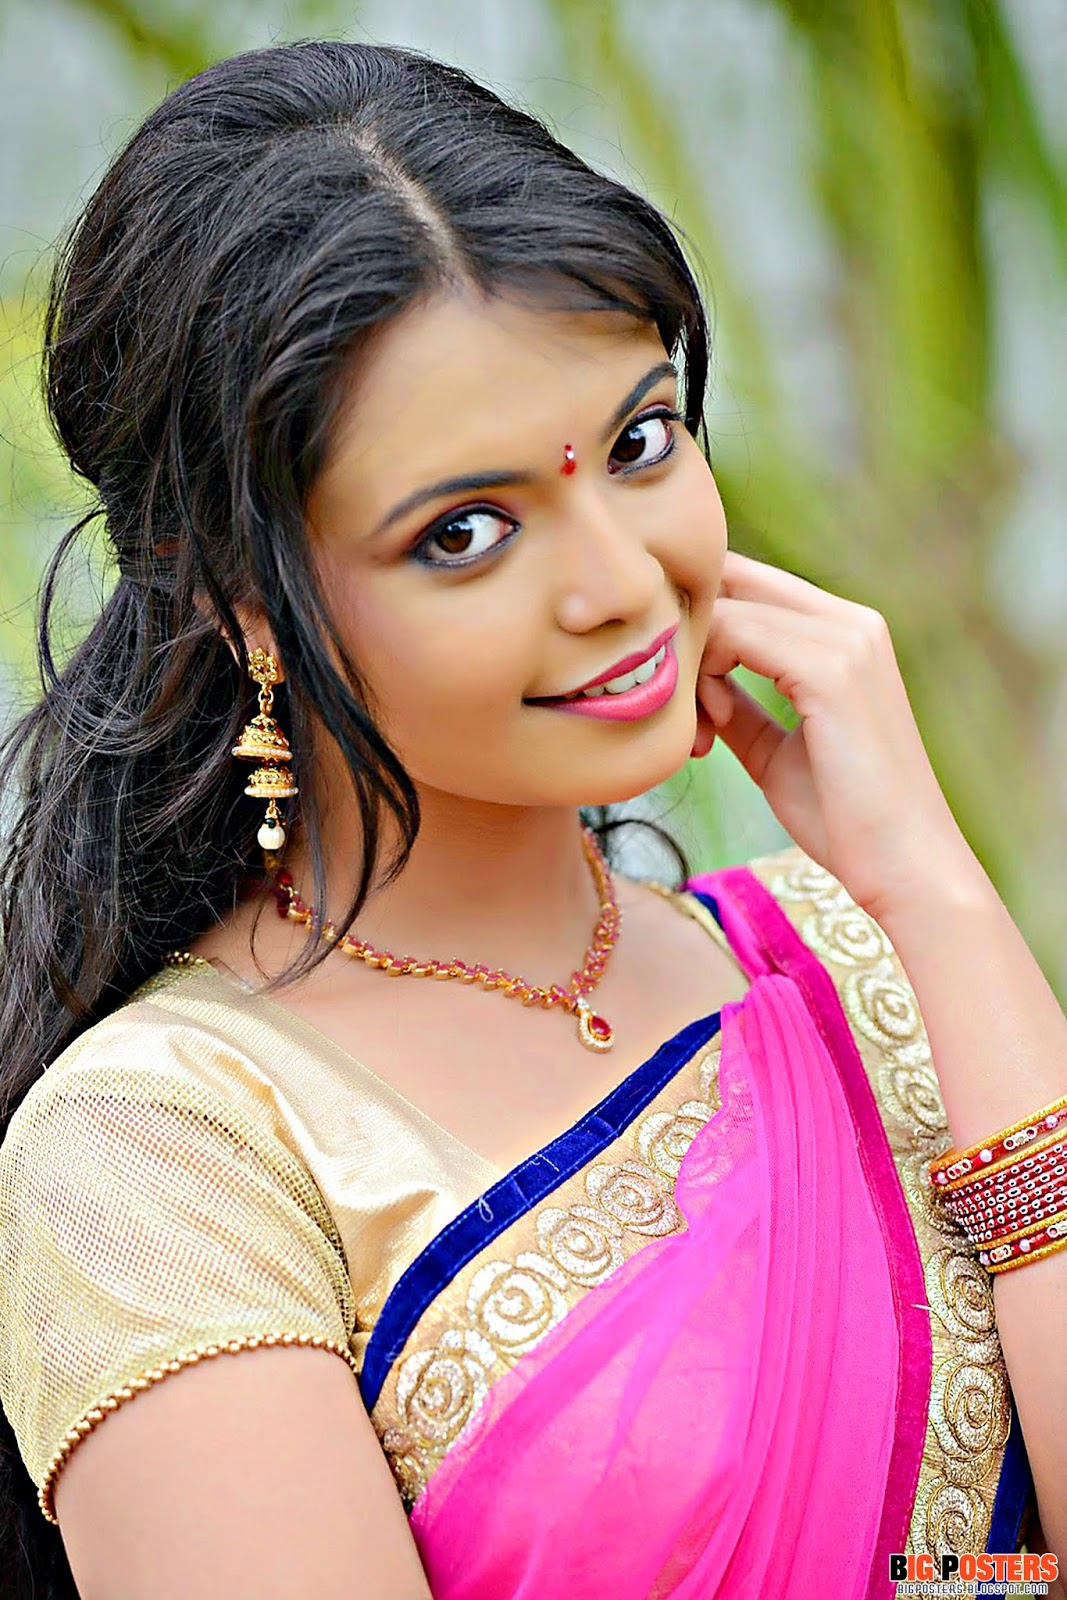 cute-marathi-girl-closeup-babes-masterbating